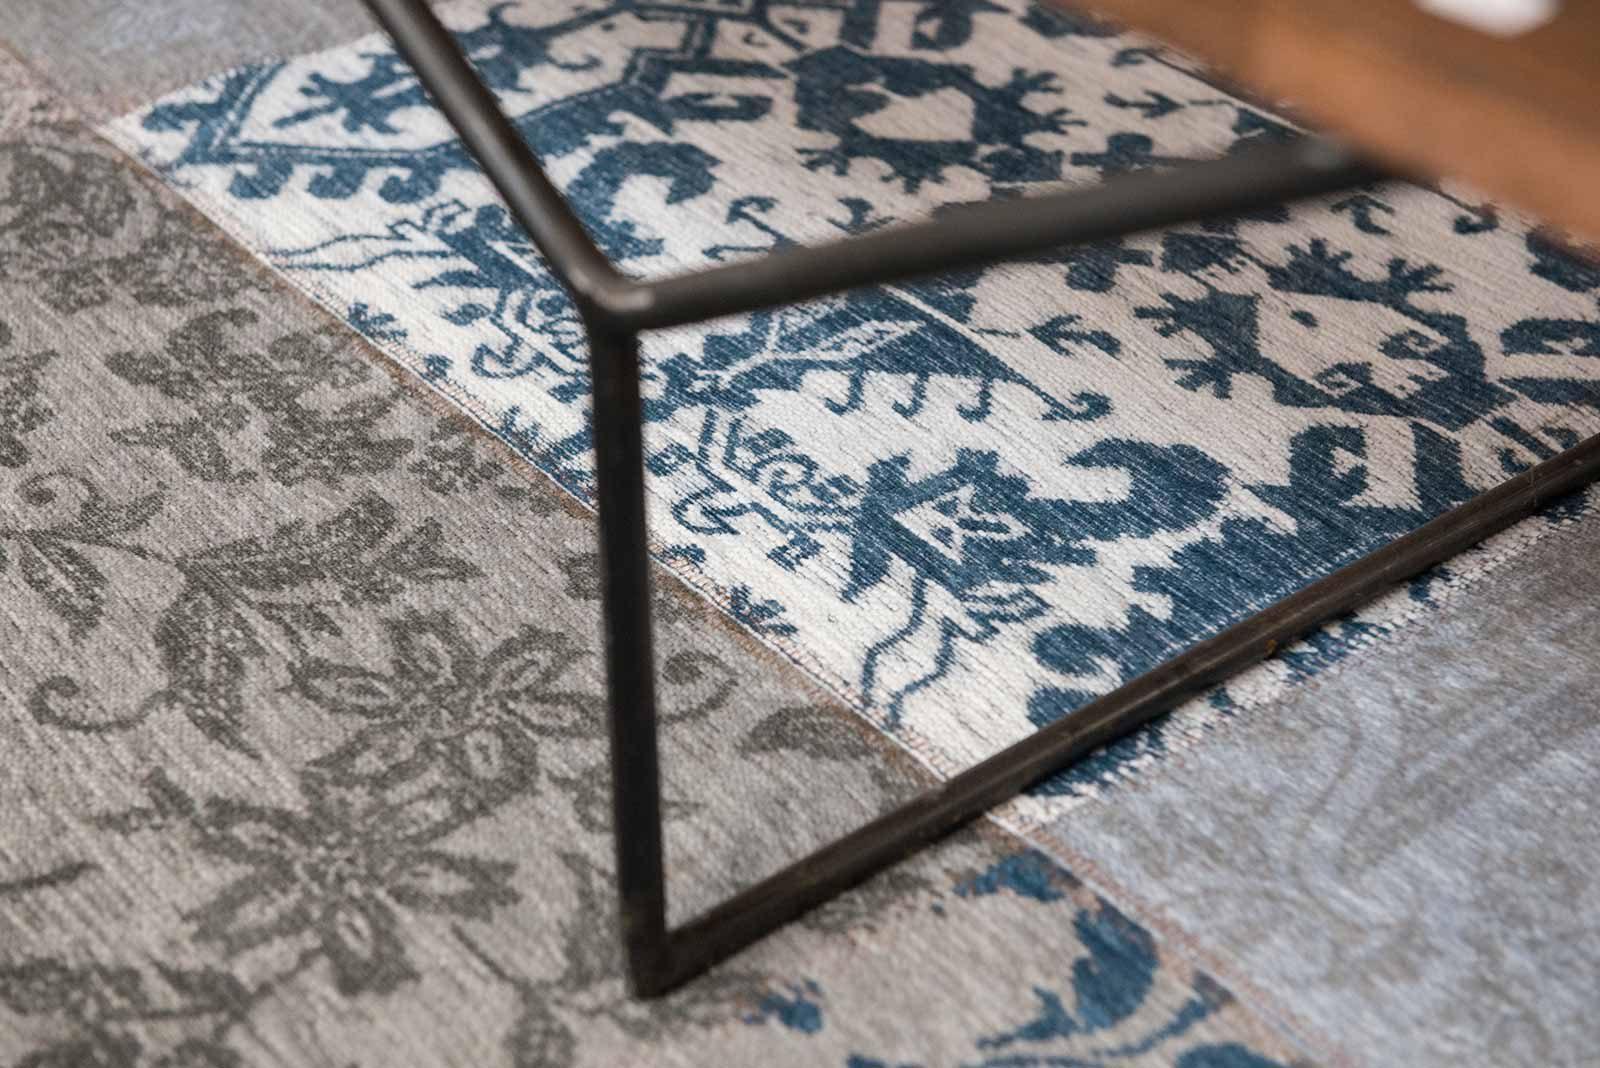 rugs Louis De Poortere LX8981 Vintage Bruges Blue zoom